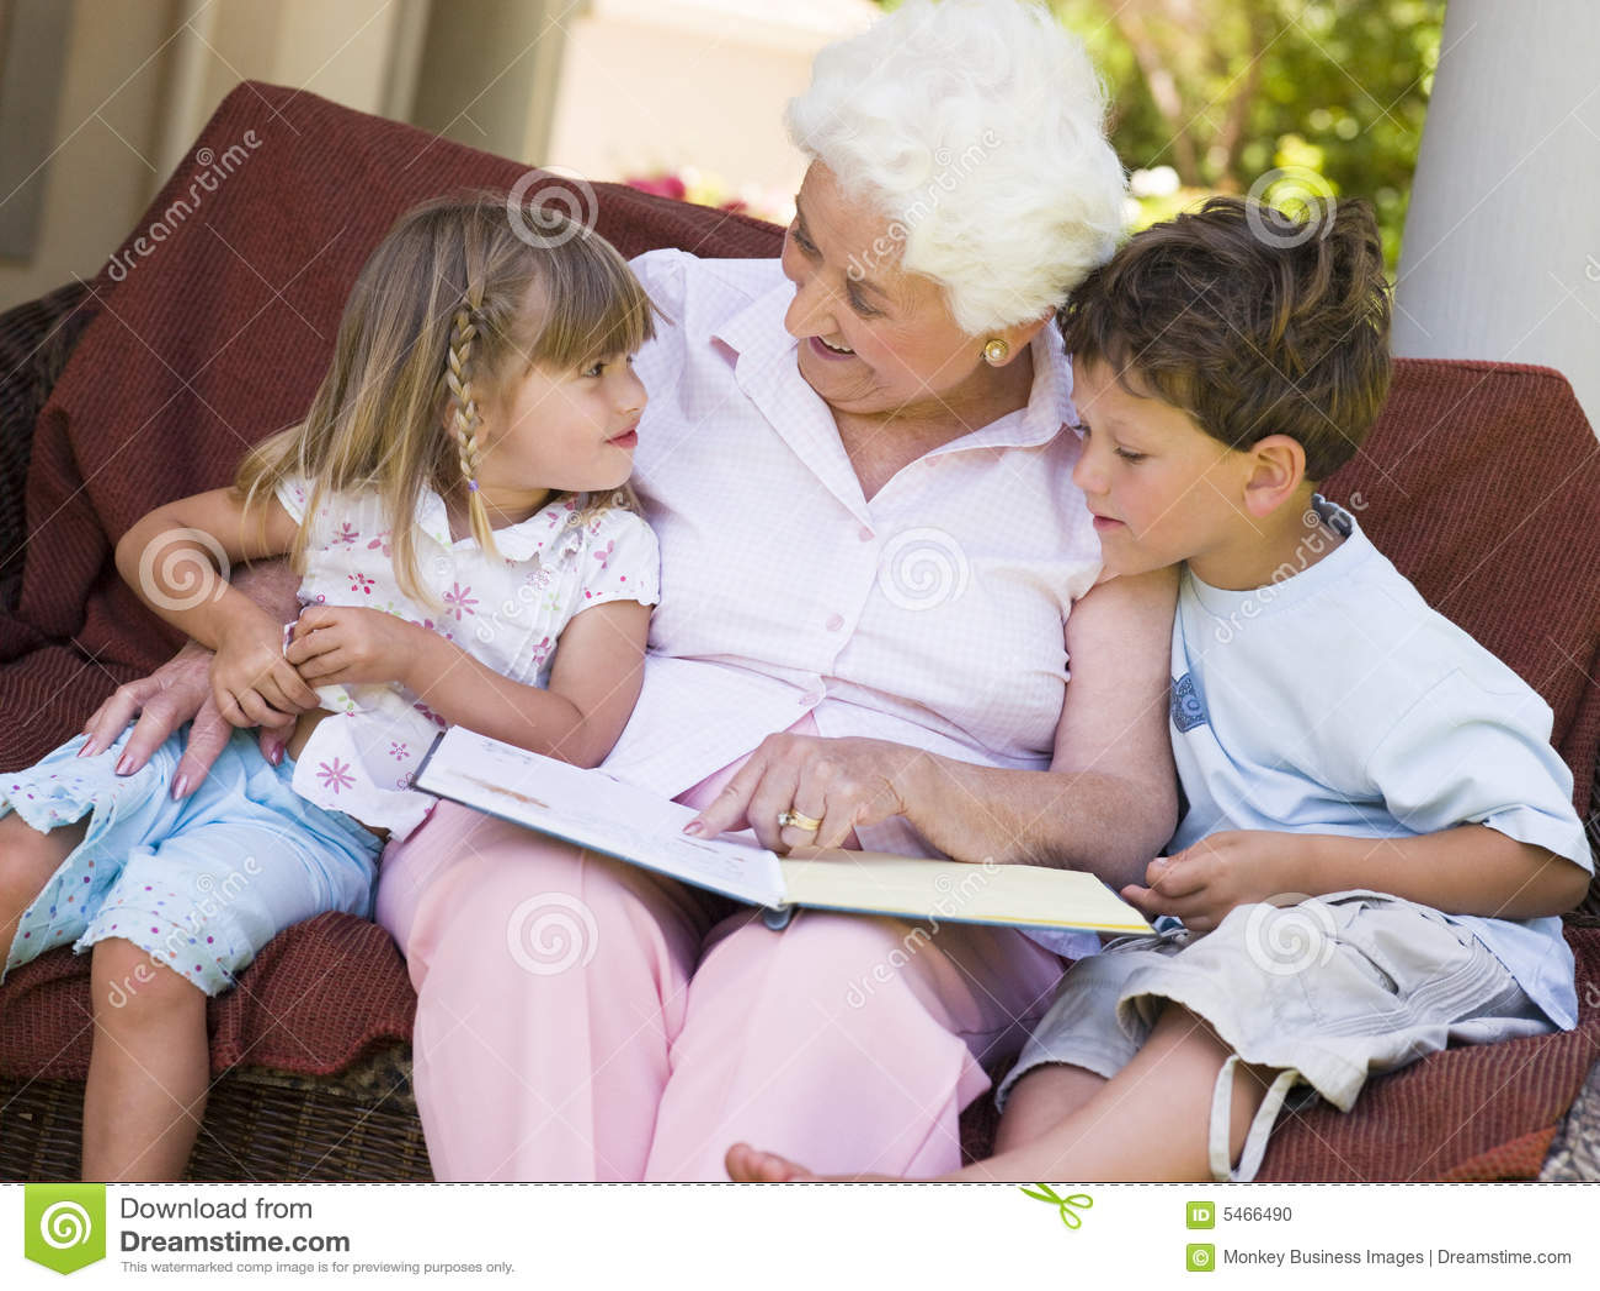 Як внук трахає бабушку 8 фотография